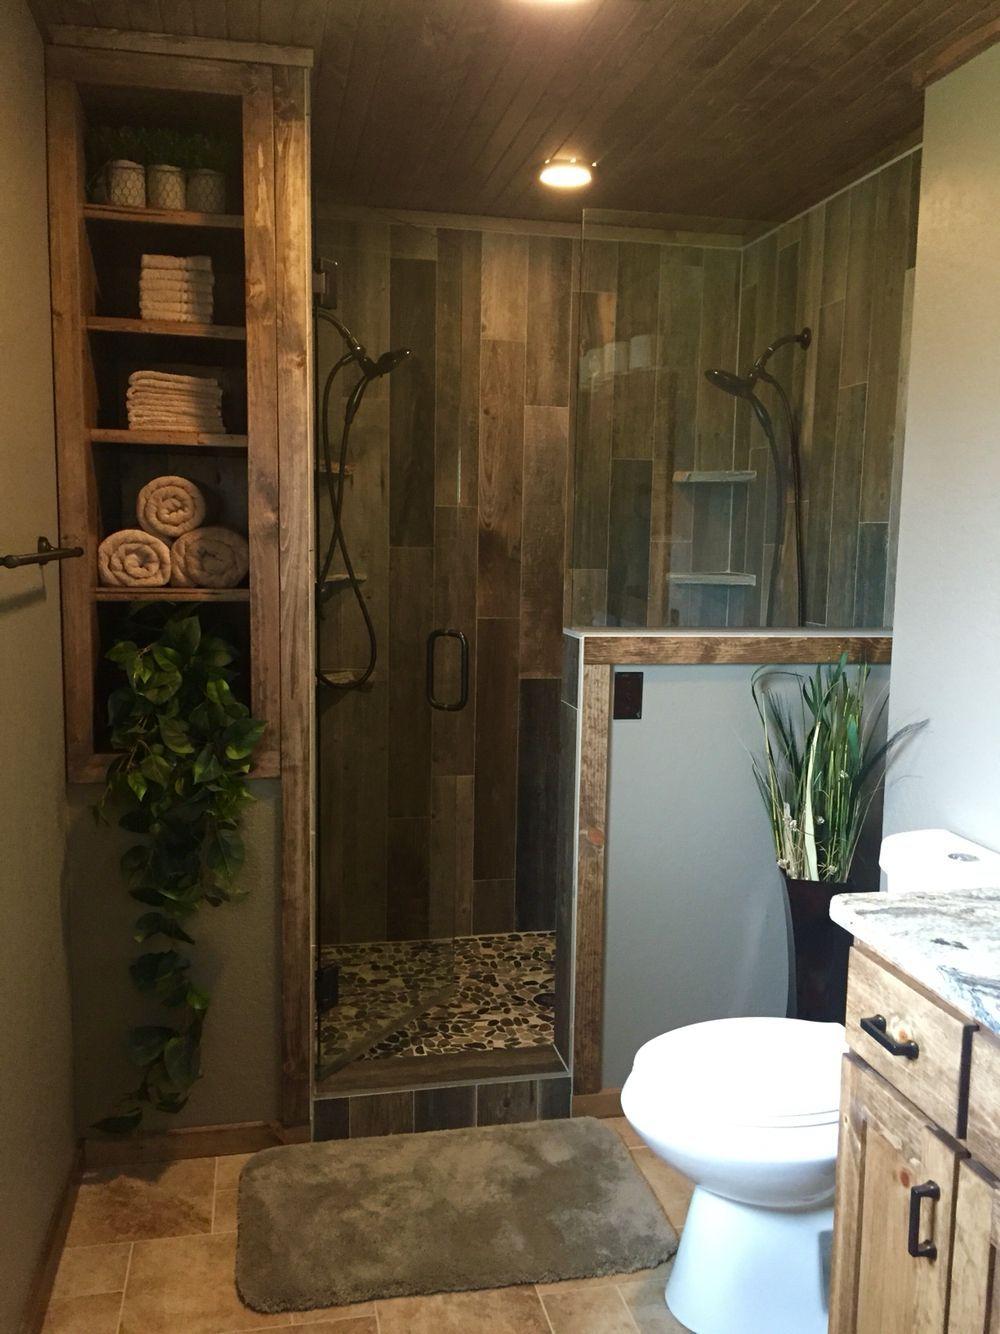 Best 49 Reference Of Bathroom Ideas With Wood Tile Floors In 2020 Bathroom Remodel Master Bathroom Remodel Designs Modern Farmhouse Bathroom